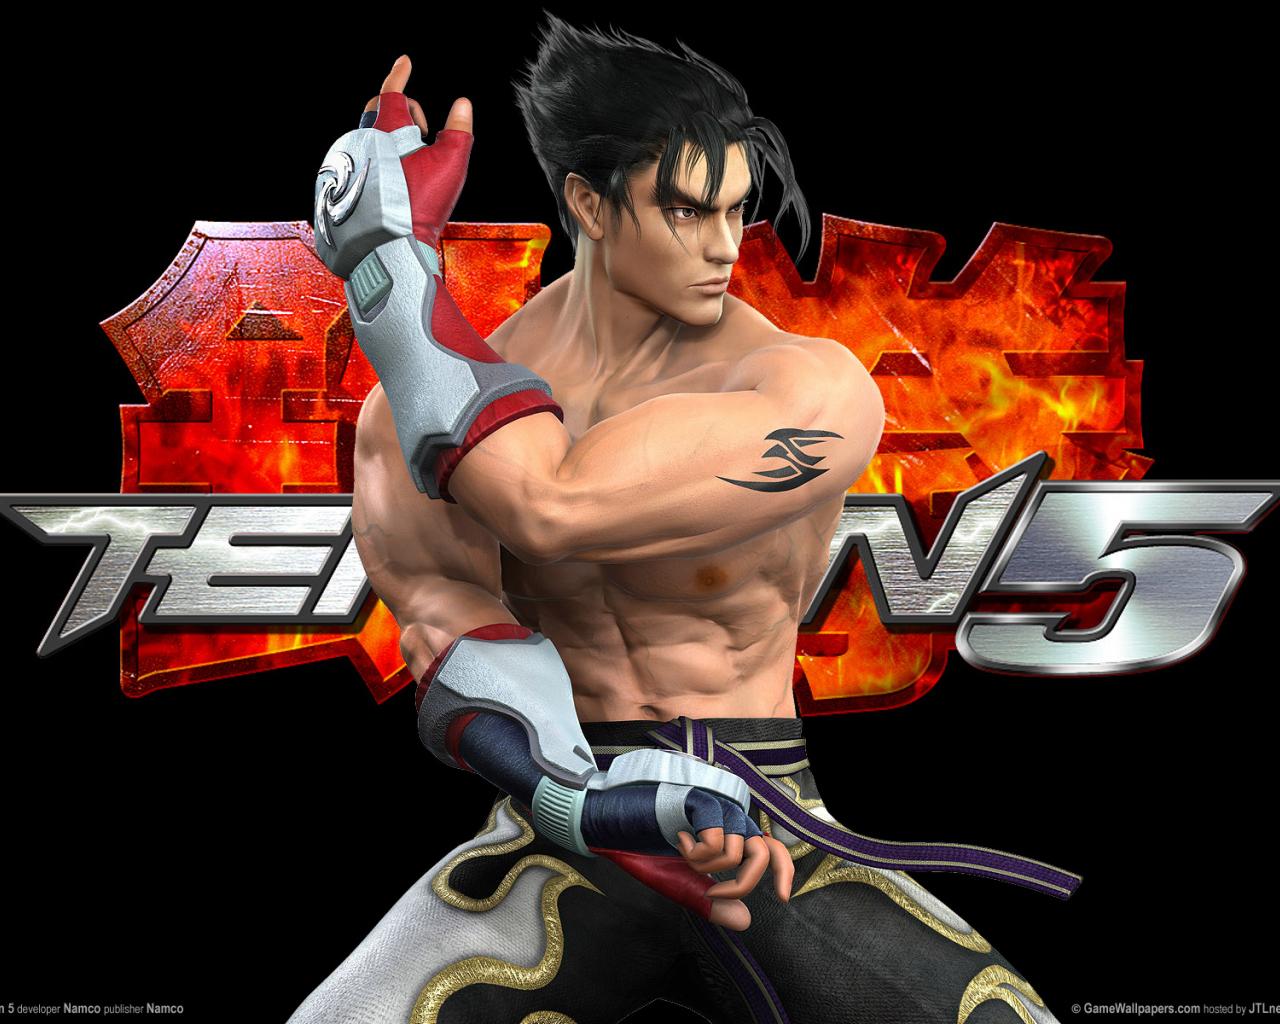 Tekken 3 mobile game free download - normalhorsejohn's diary